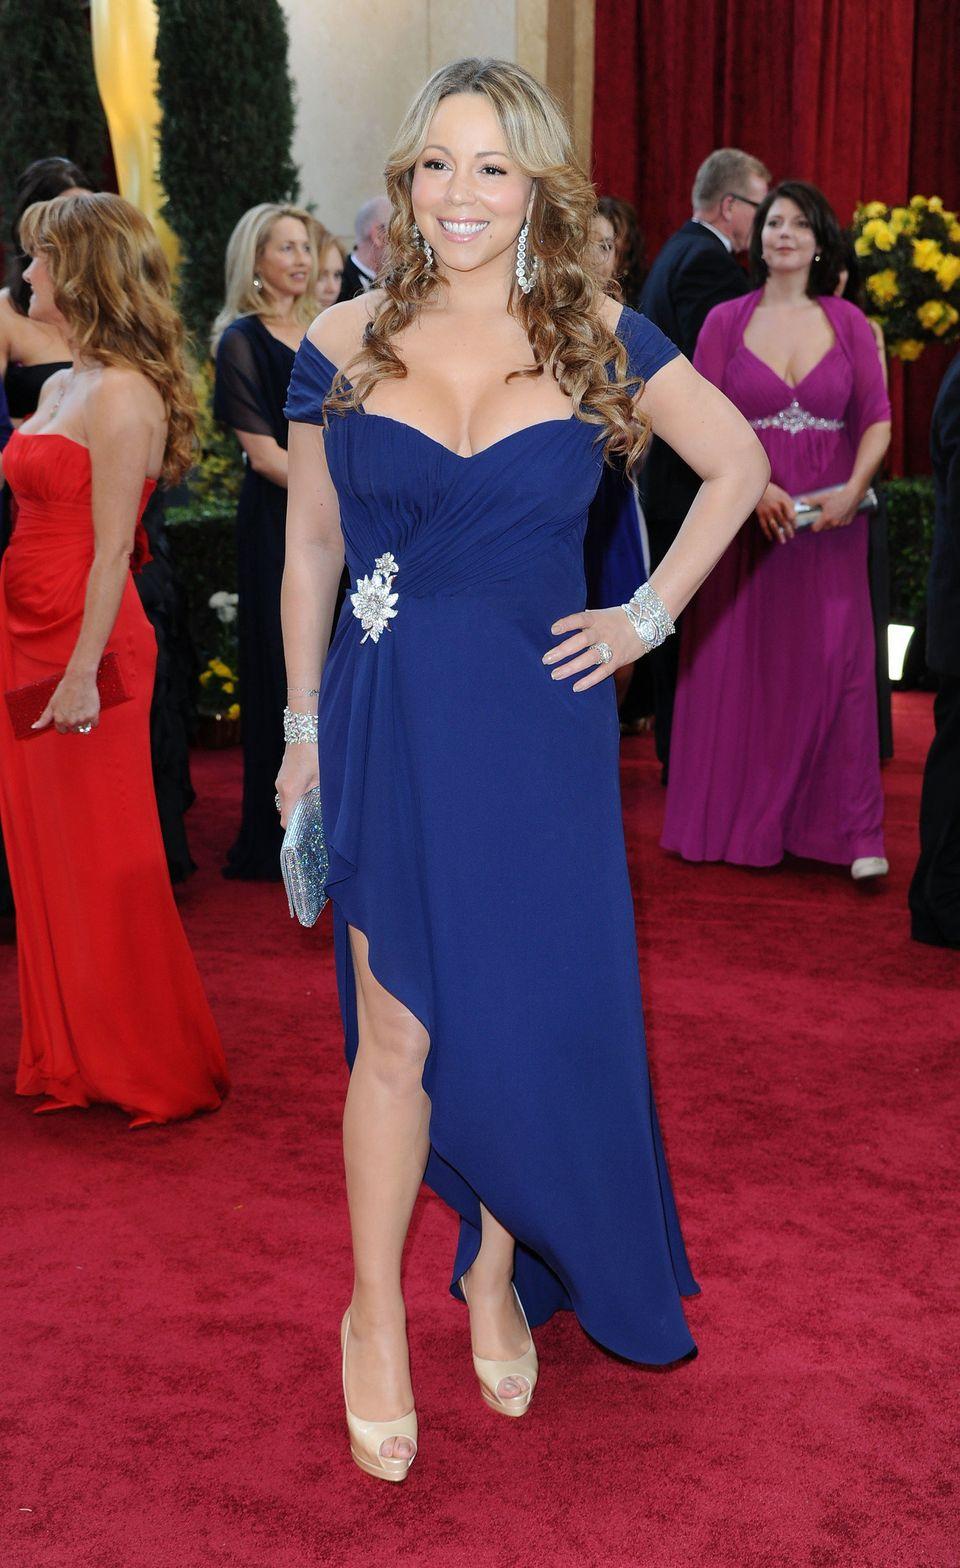 Mariah looking like her usual (fabulous)